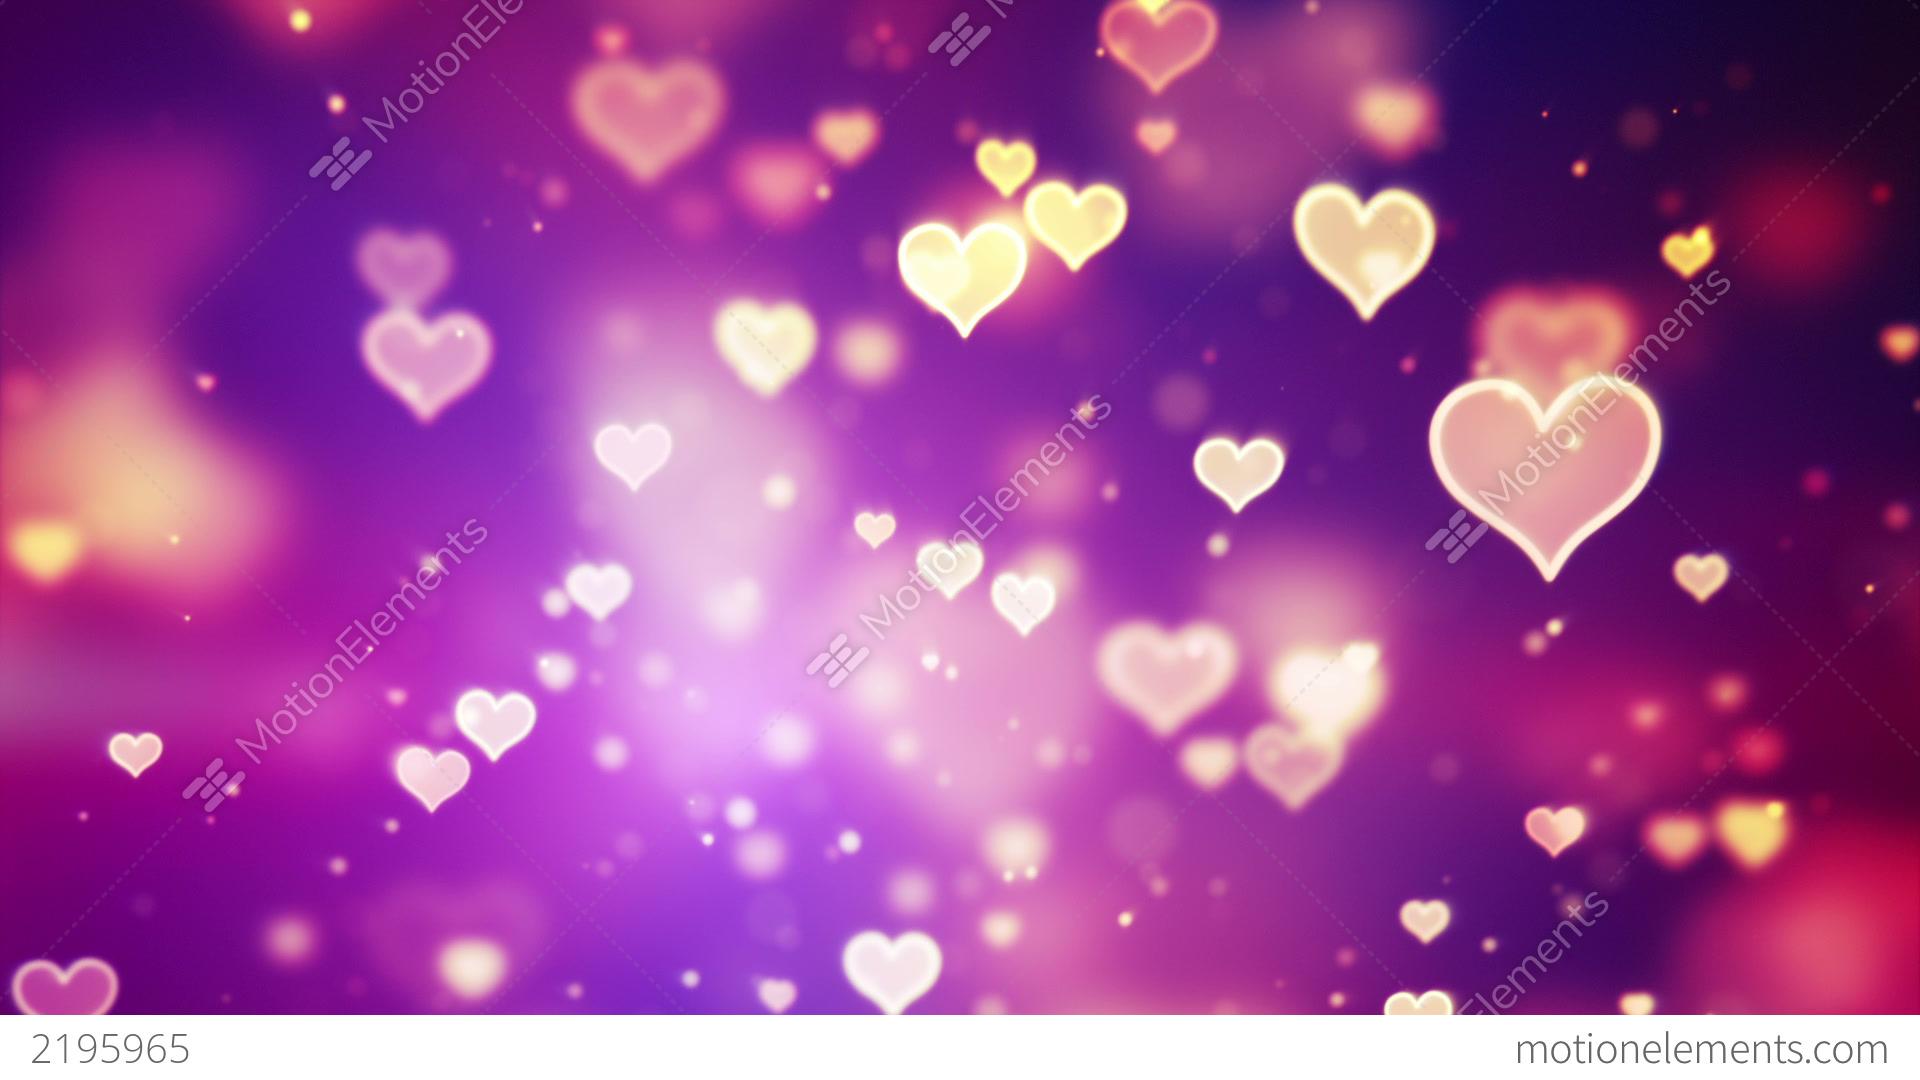 Shining Hearts Bokeh Loopable Romantic Background Stock Animation 2195965